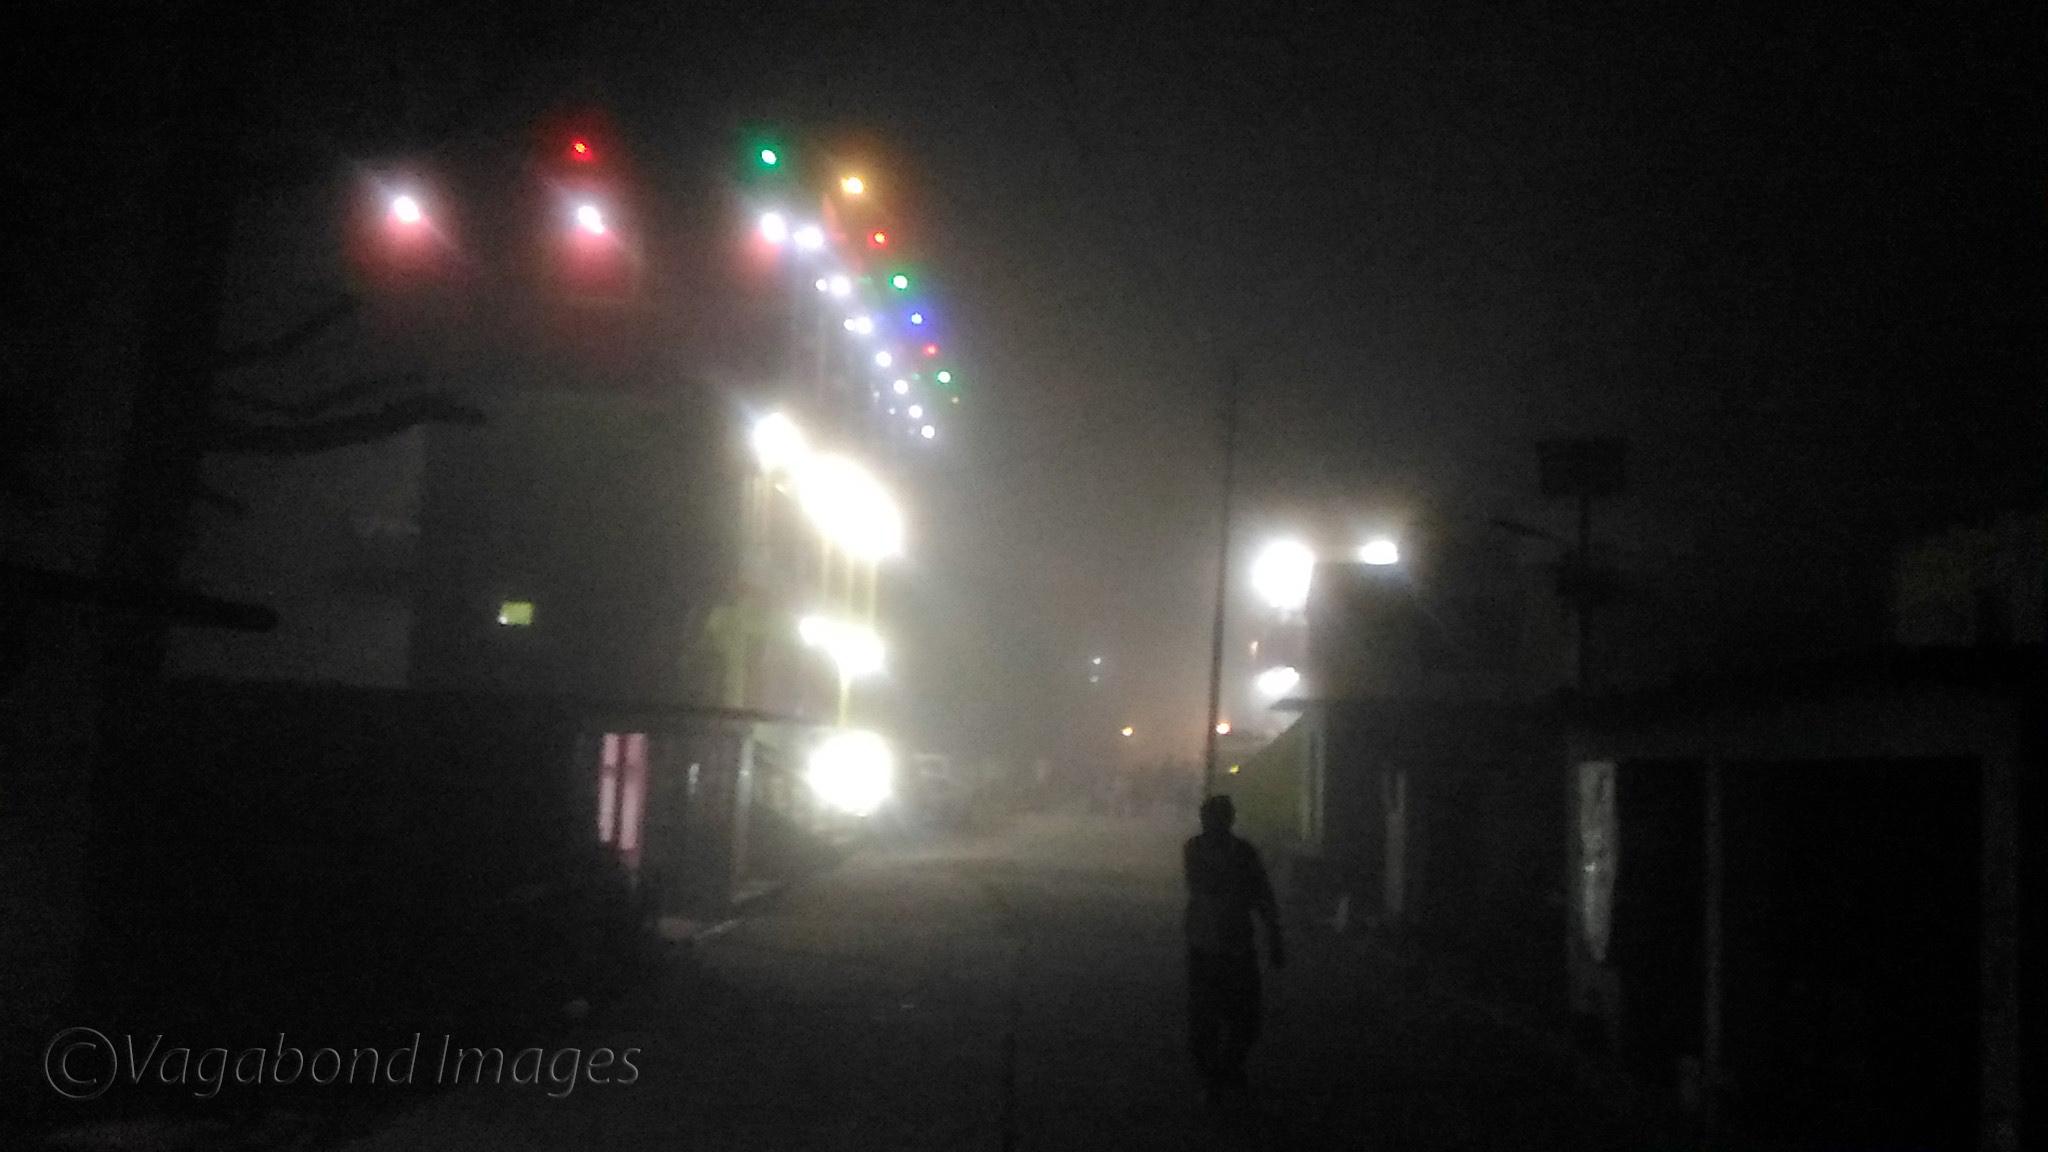 Man in the mist!